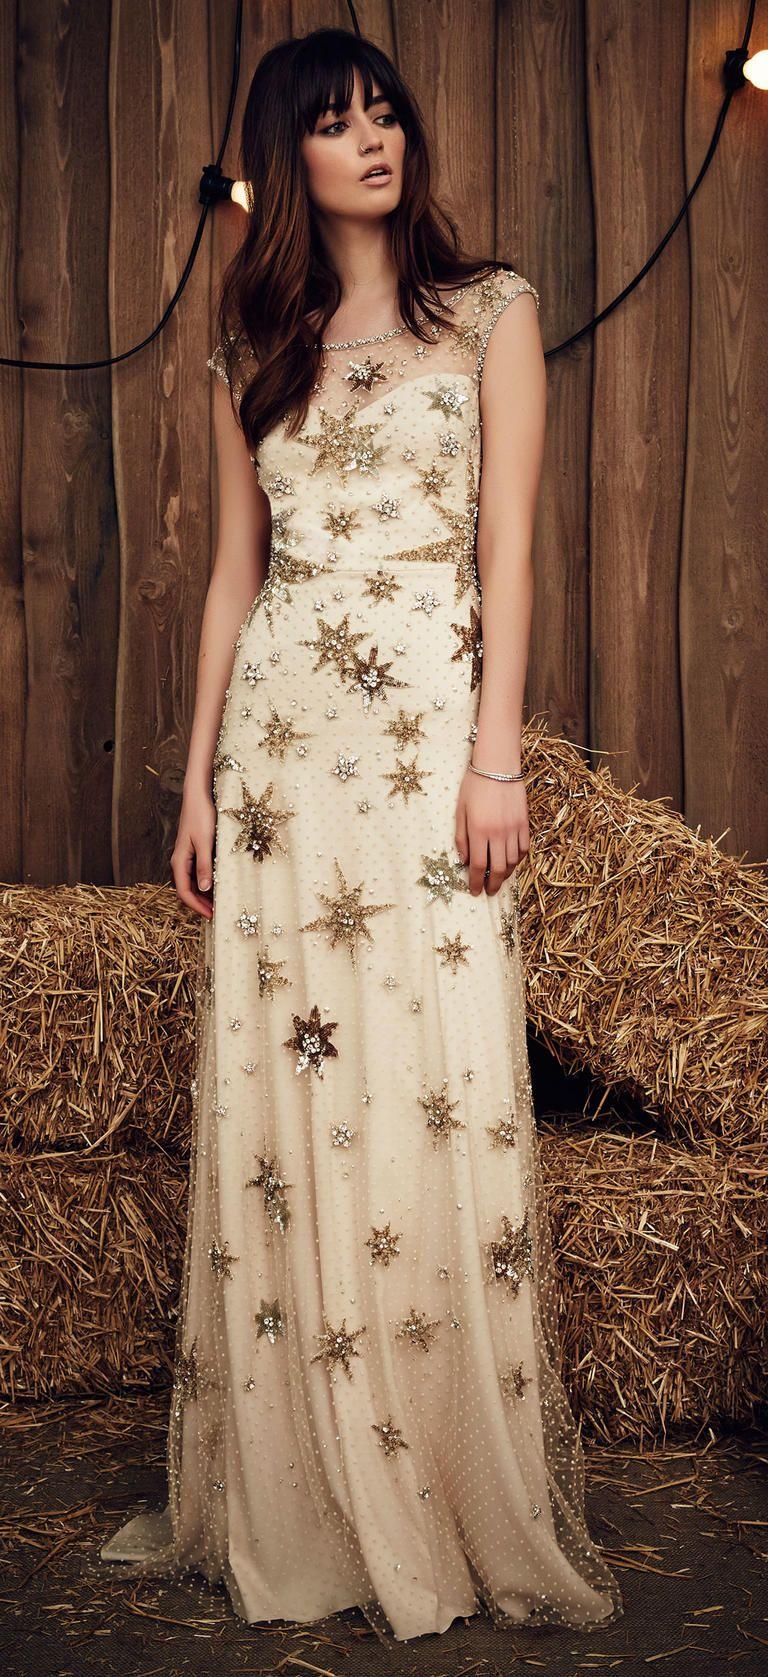 Tasar�mc�n�n Minimalizm Ile ş�kl��� Bulu�turan Gelinlik Modellerini G�rmeden Ge�meyin Unique Colored Wedding Dresses Gypsy: Gold Gypsy Wedding Dresses At Reisefeber.org